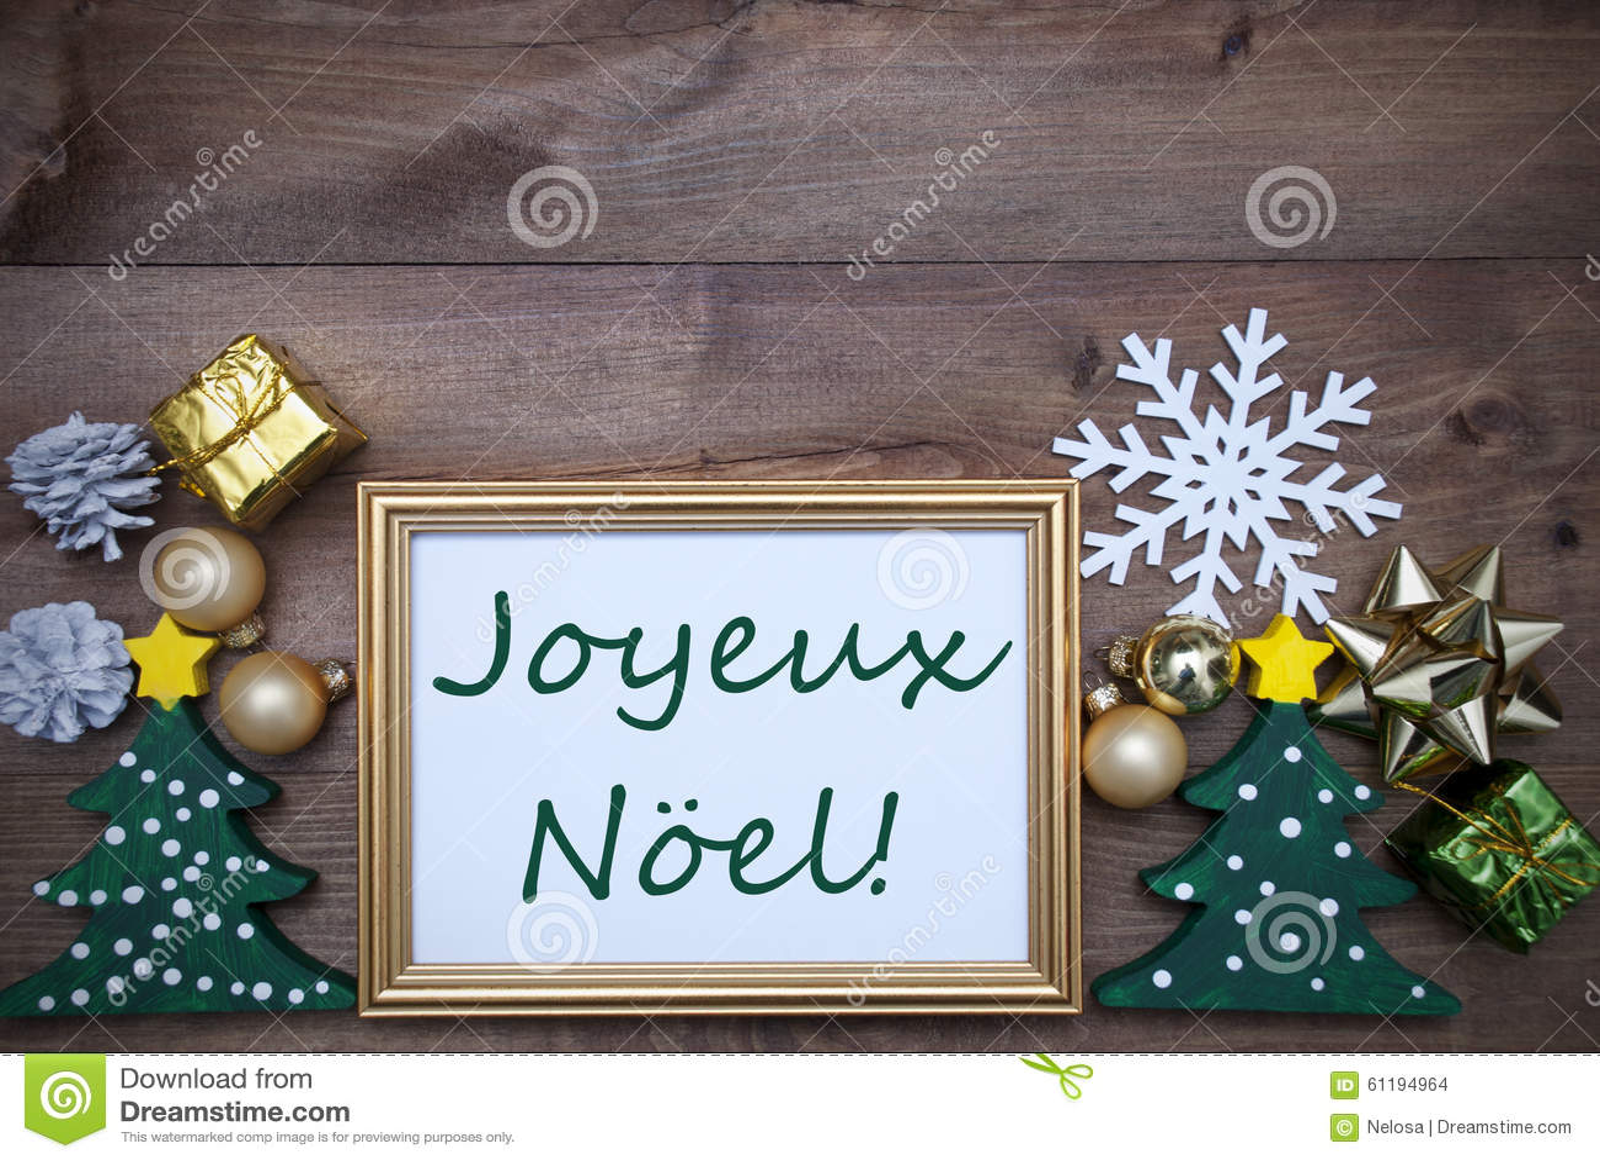 Frame With Decoration, Joyeux Noel Mean Merry Christmas Stock Photo ...